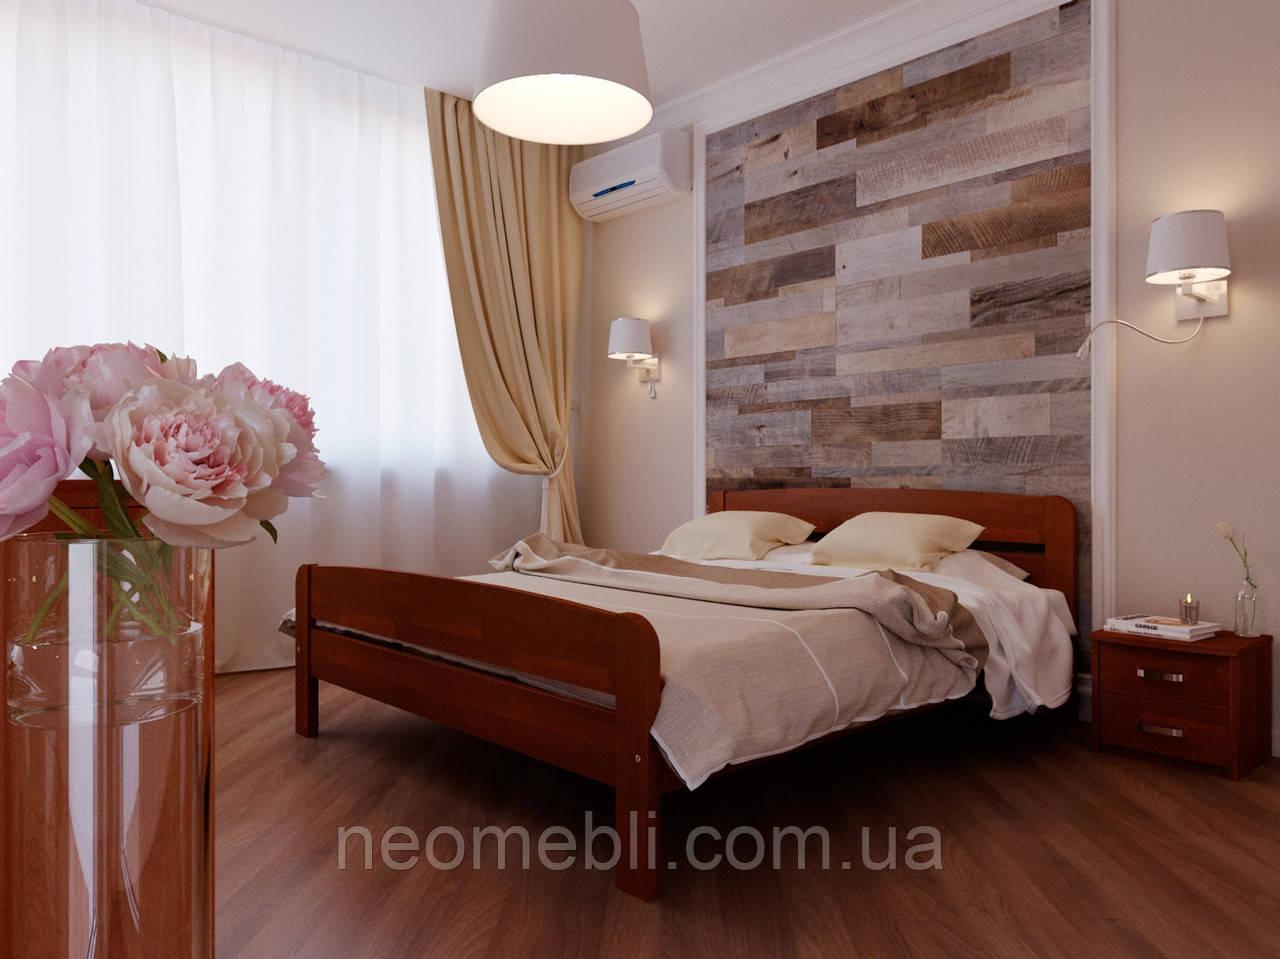 Деревянная кровать НеоМеблі Октавия С2   140х190  яблуня